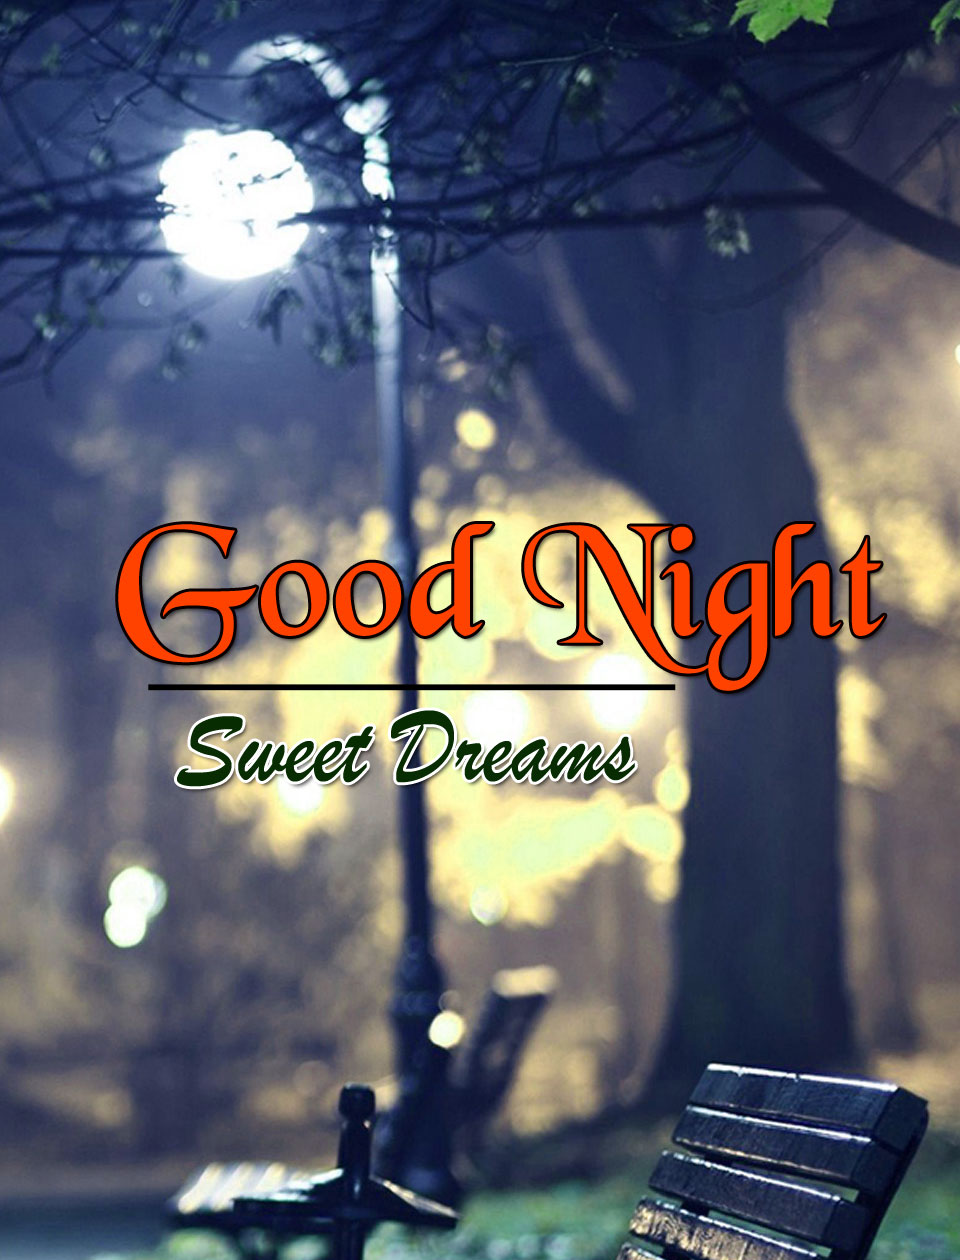 Good Night Wishes Wallpaper for Whatsapp